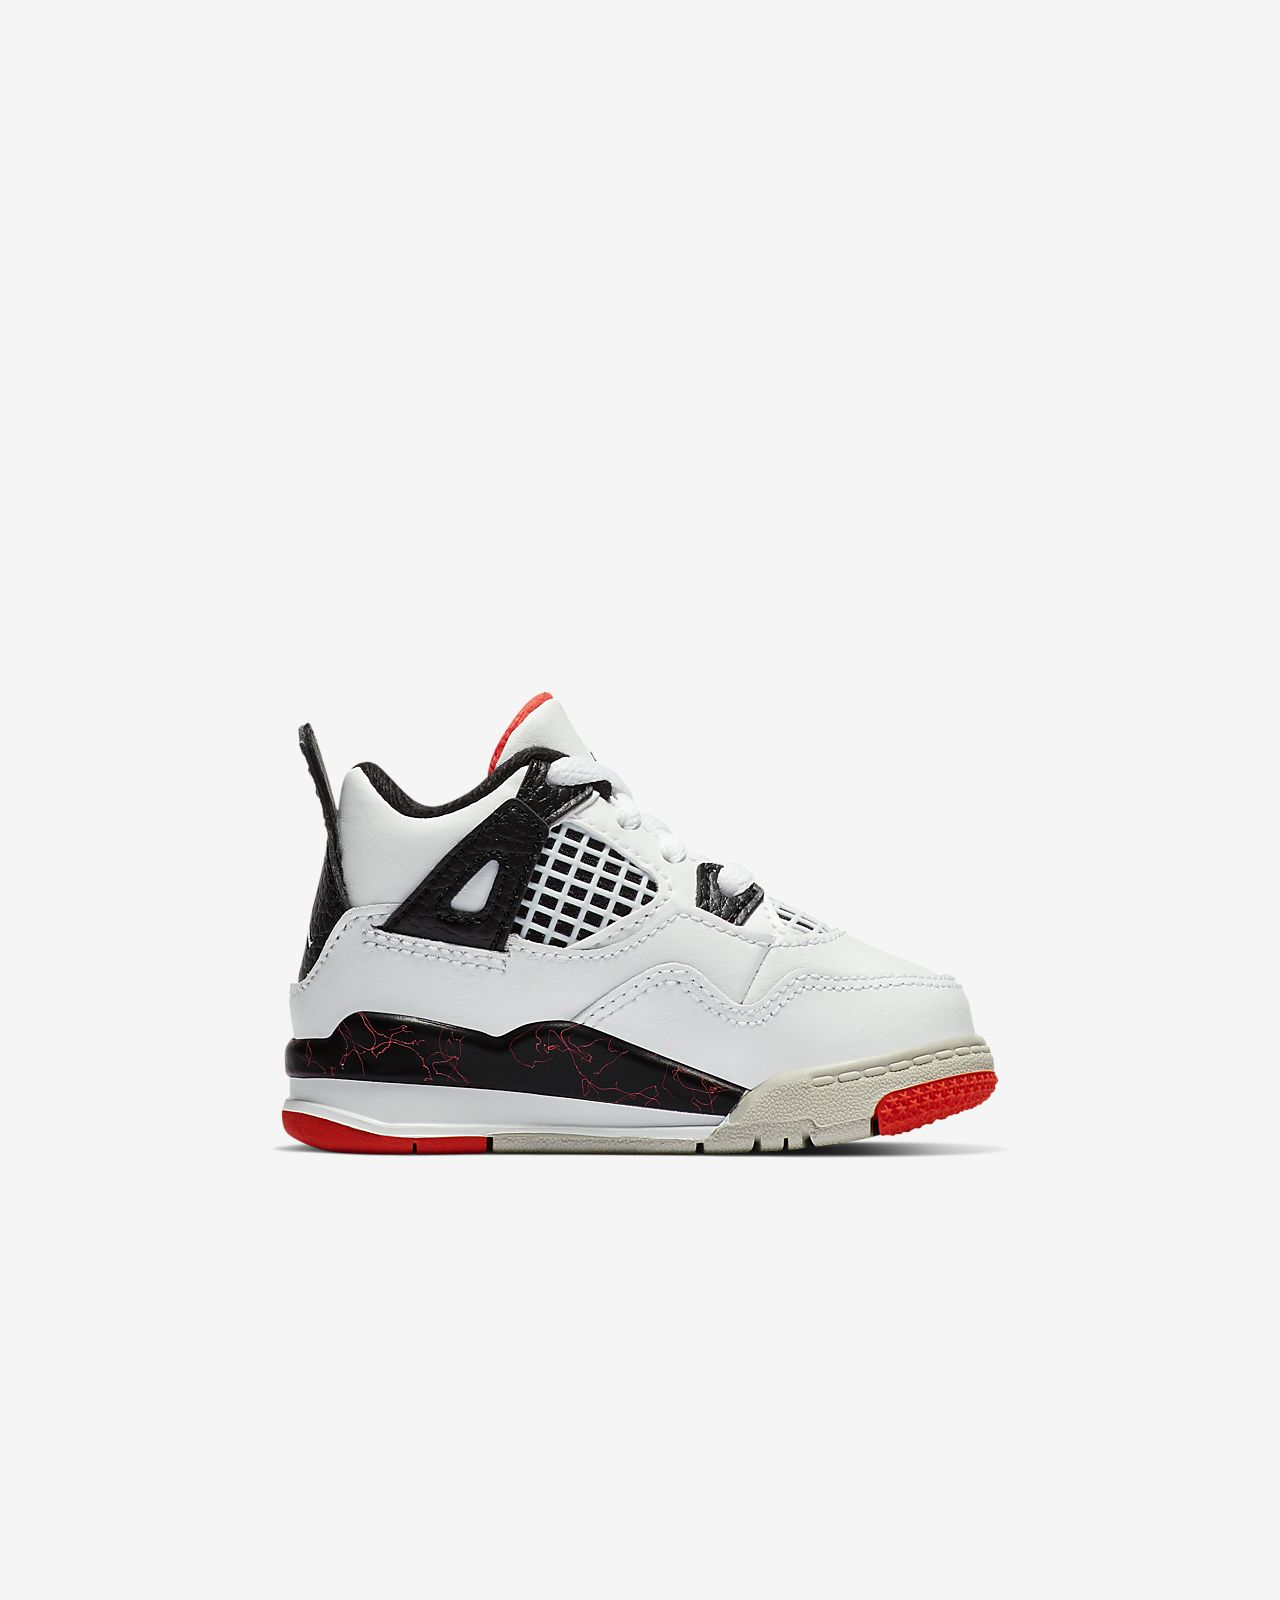 ad647f6ce1615 Air Jordan 4 Retro Baby & Toddler Shoe. Nike.com ID